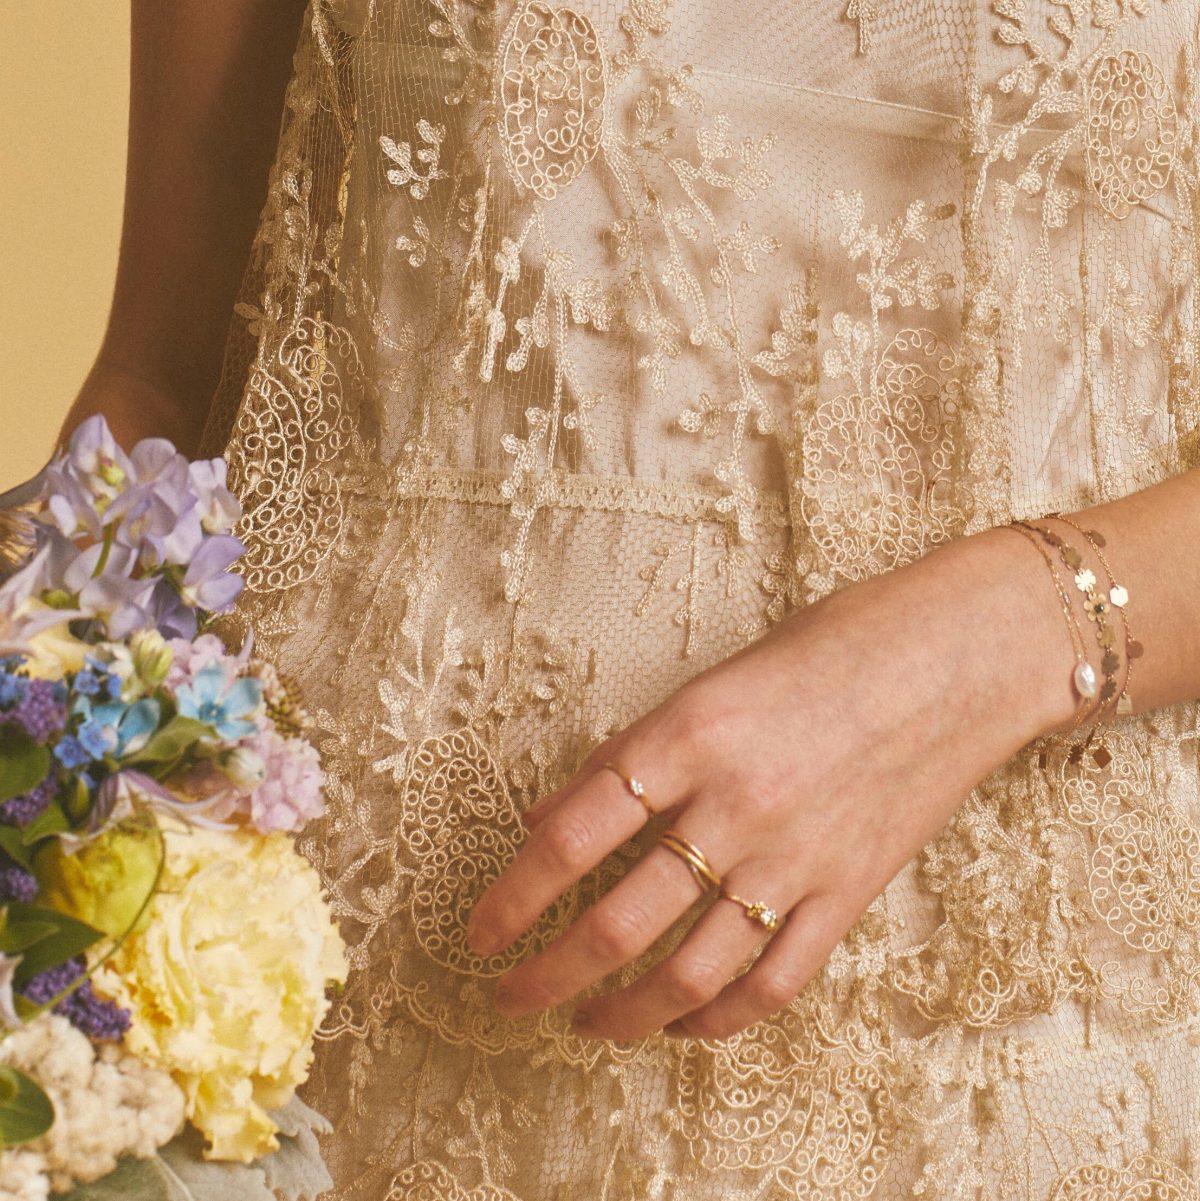 HPFRANCEBIJOUX 結婚 指輪 婚約 アッシュペー アッシュペーフランス アッシュペービジュー マリッジ エンゲージ